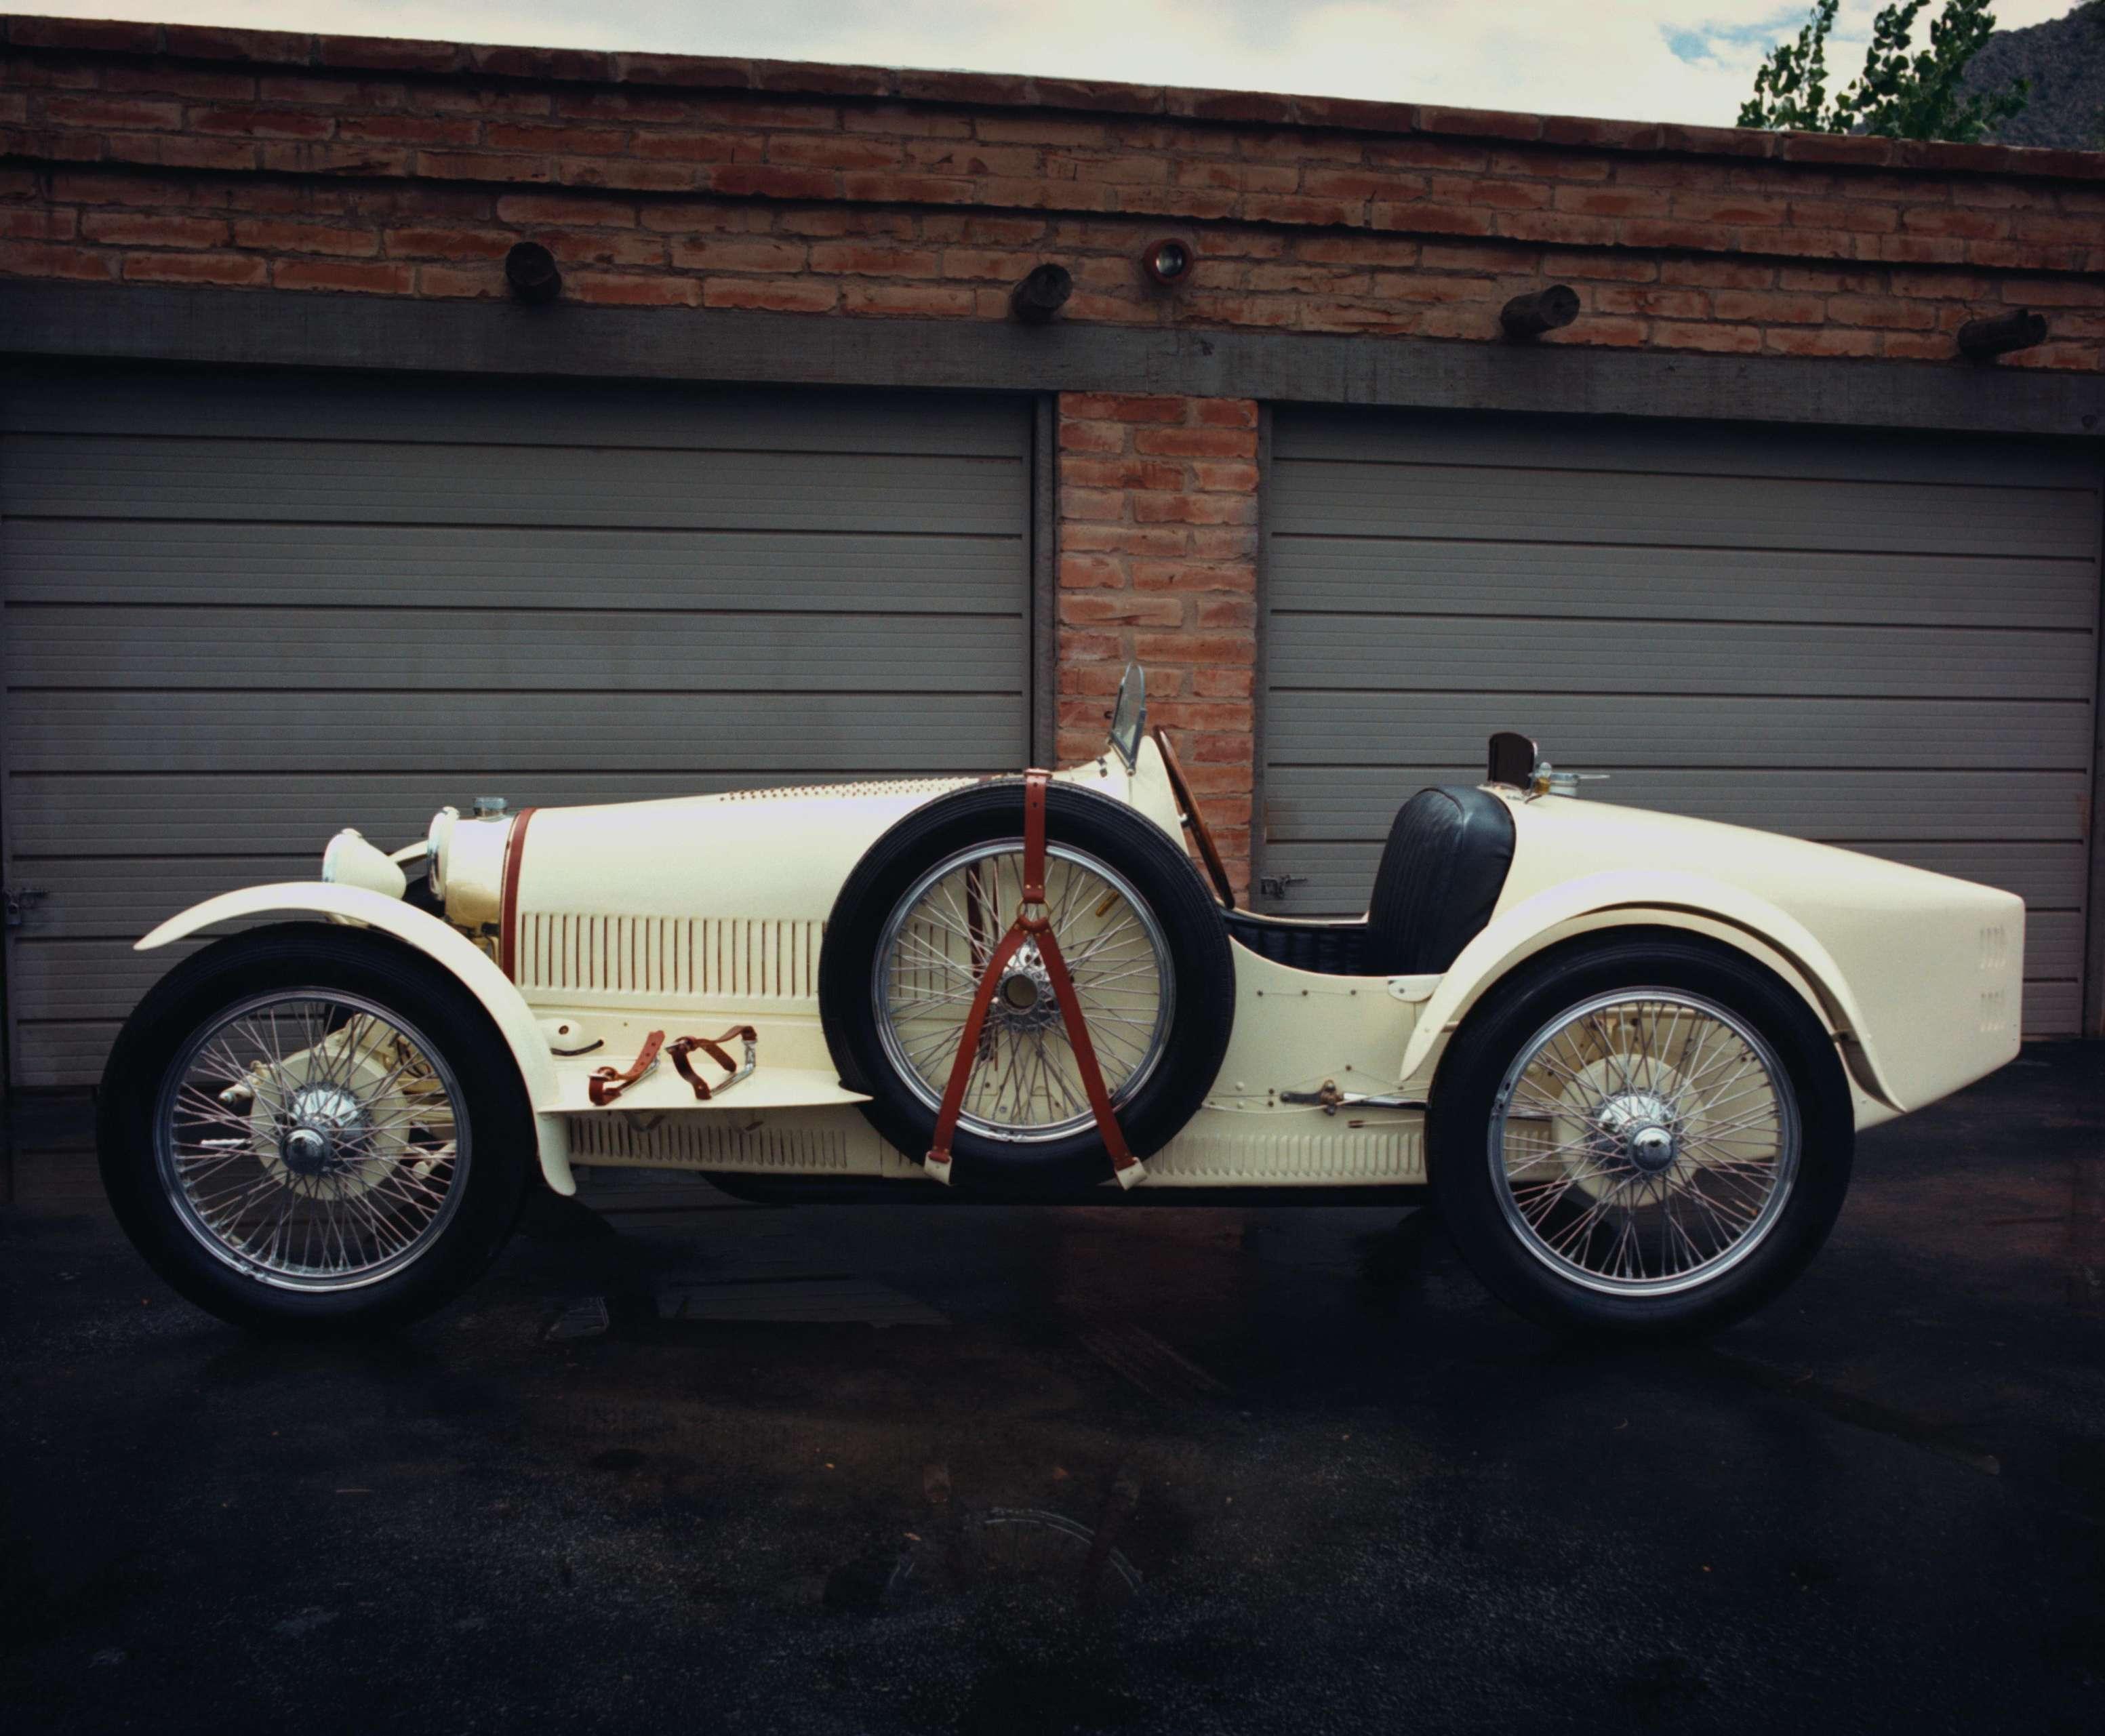 1937 bugatti type 57sc atalante coupe 7616350. Black Bedroom Furniture Sets. Home Design Ideas